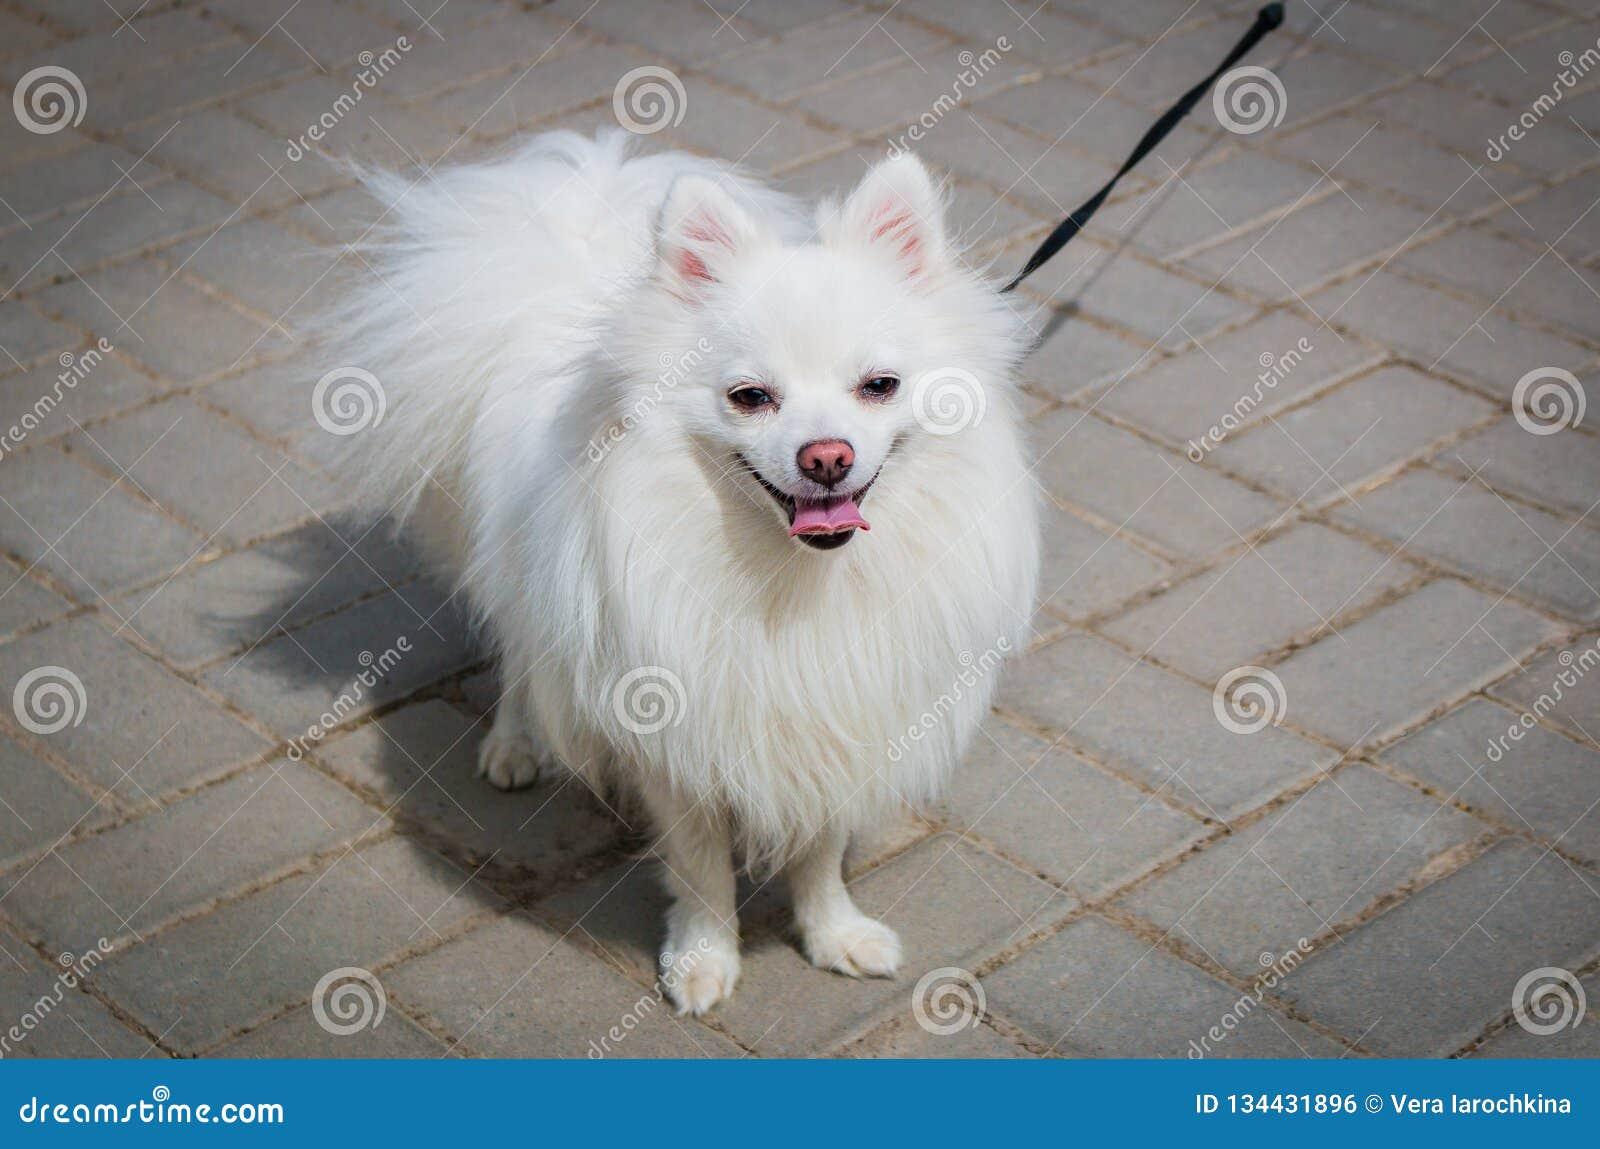 White Beautiful Fluffy Pomeranian Dog On A Leash Stock Photo Image